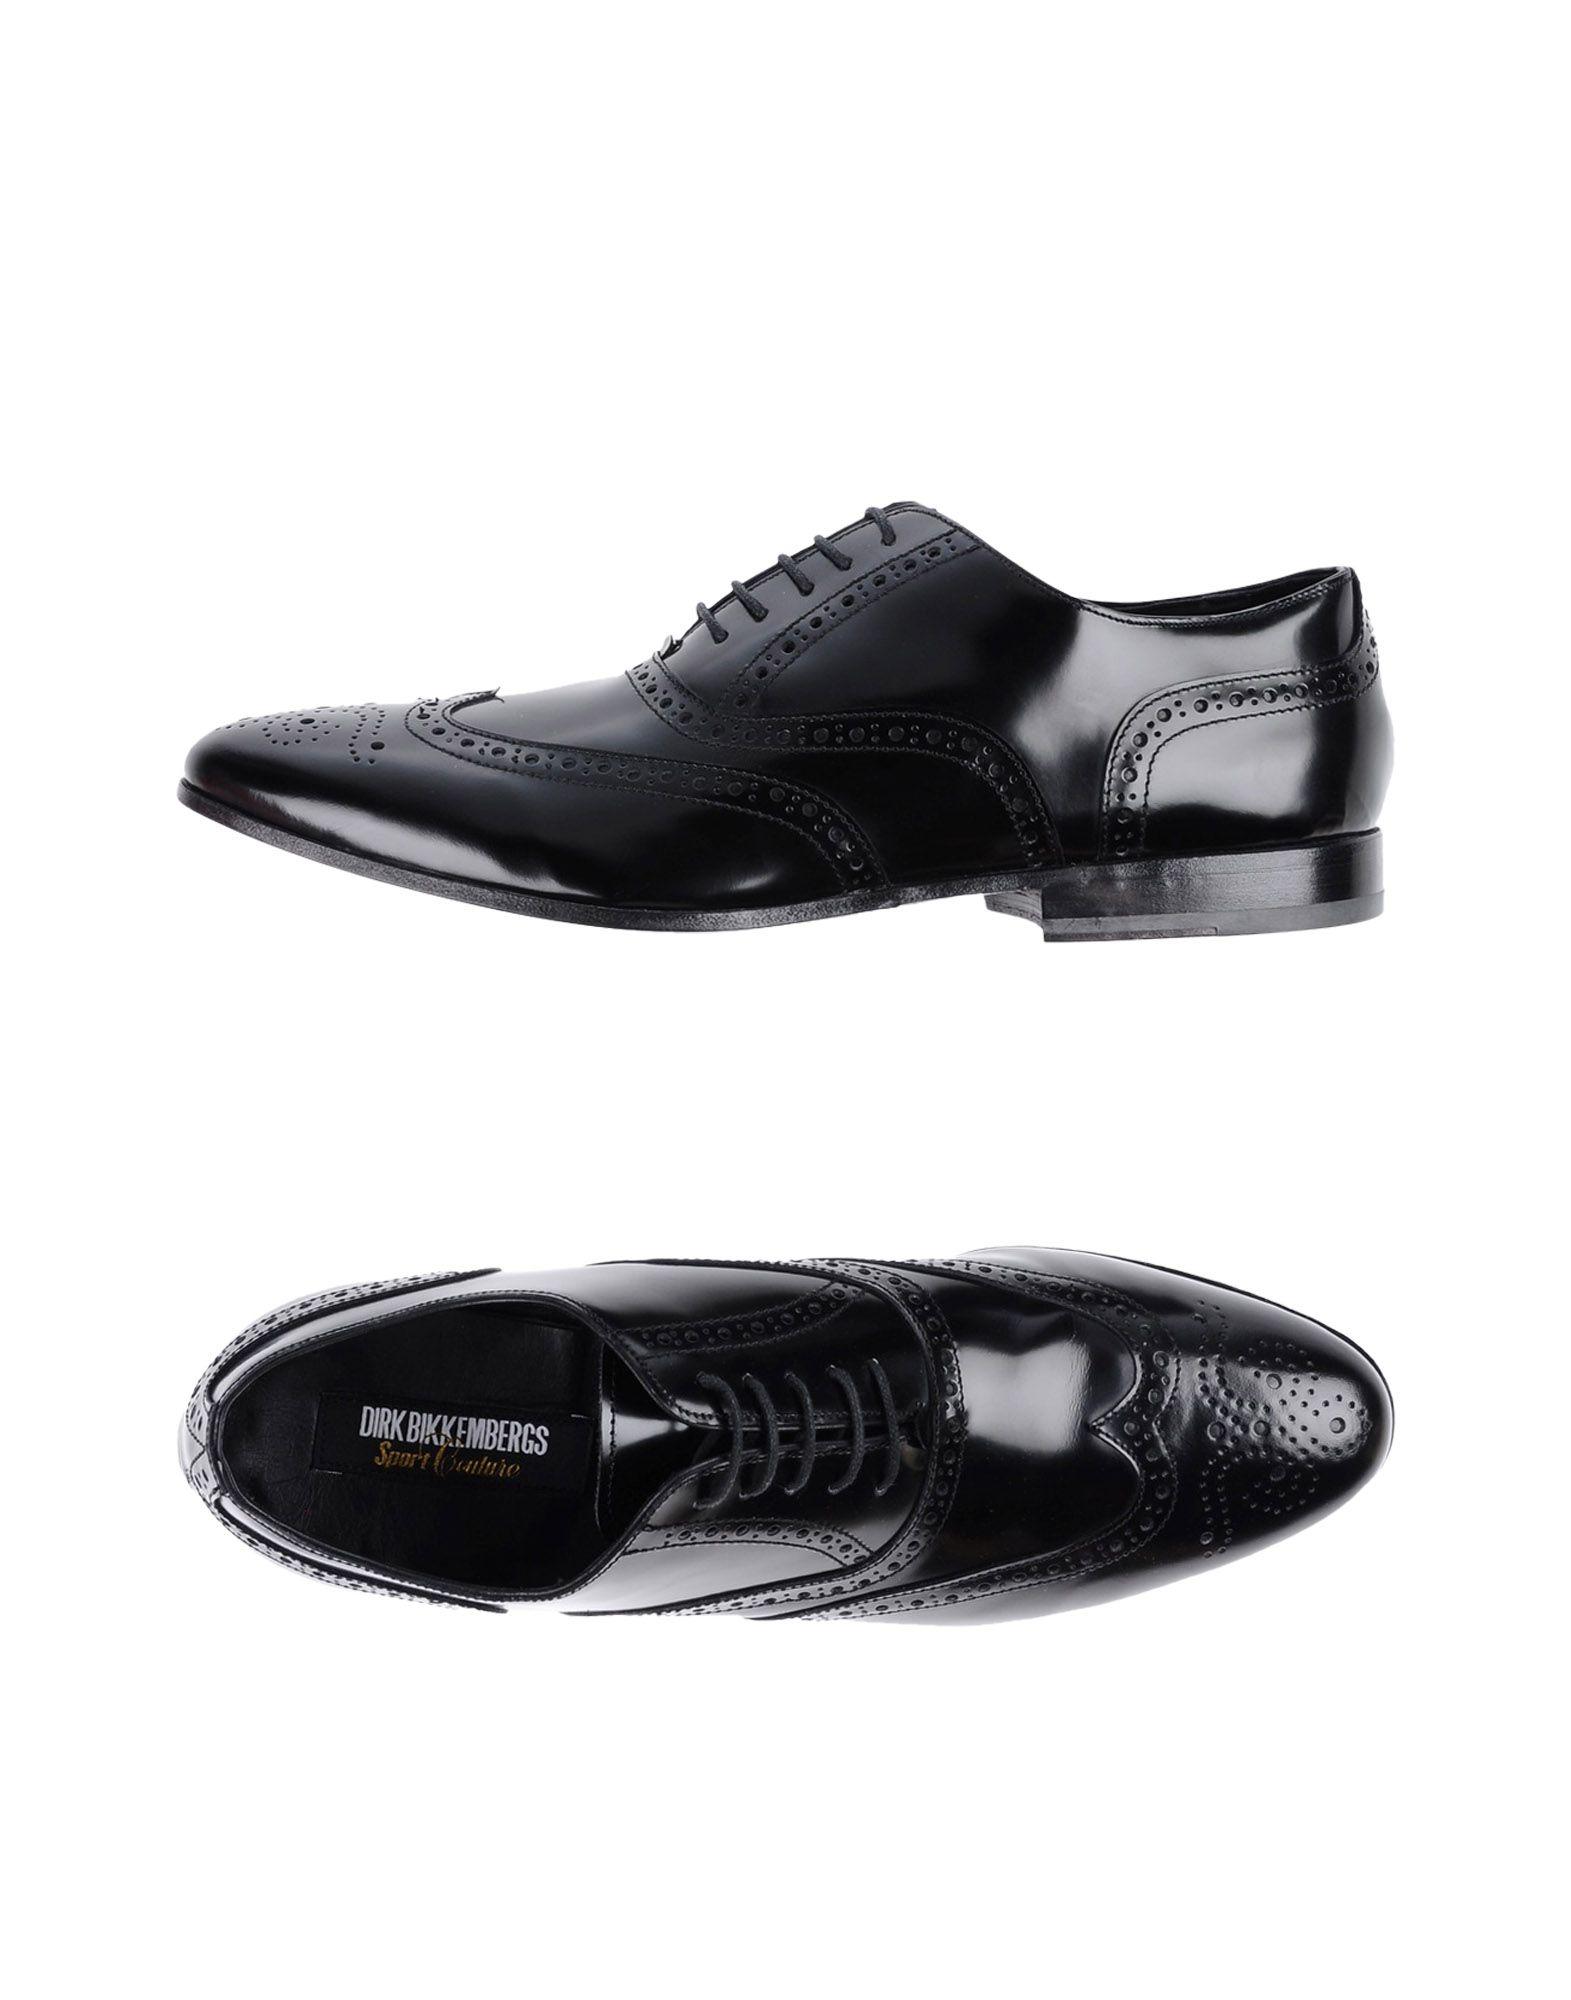 DIRK BIKKEMBERGS SPORT COUTURE Обувь на шнурках dirk bikkembergs w15073182245